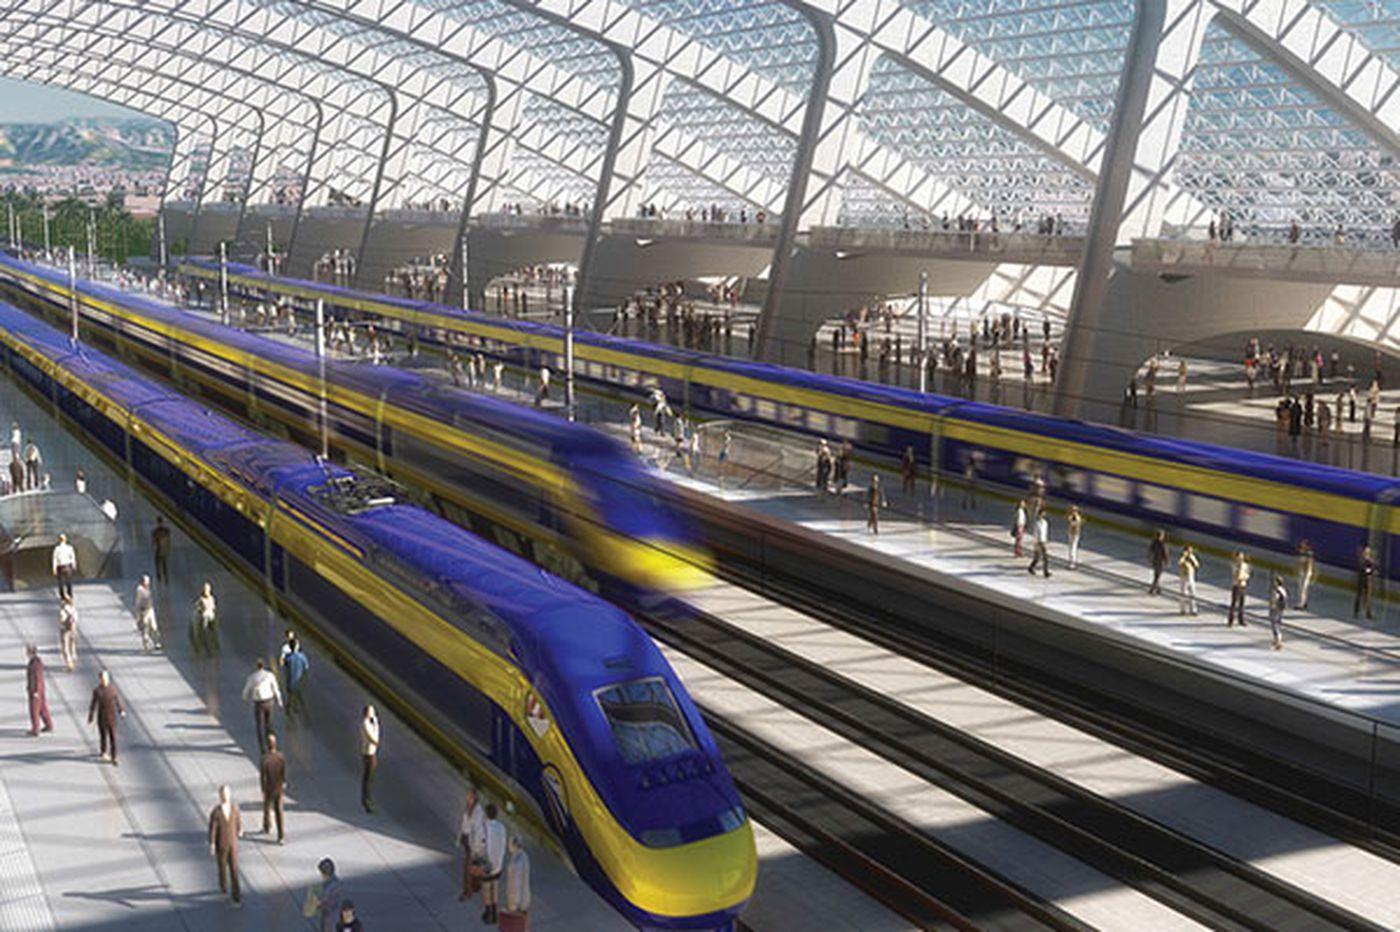 Amtrak boss urges higher speeds on Northeast Corridor